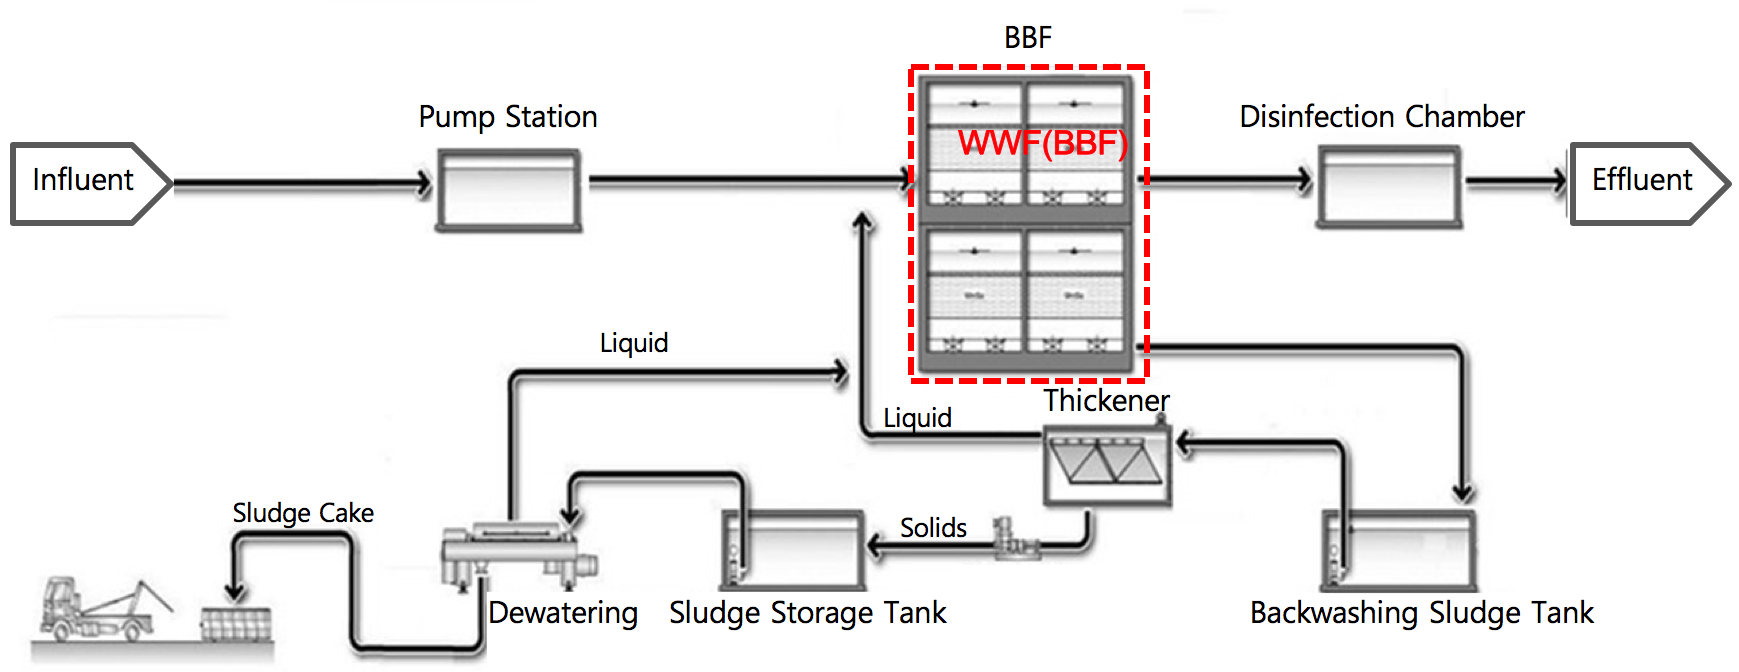 hwado process flow diagram.png